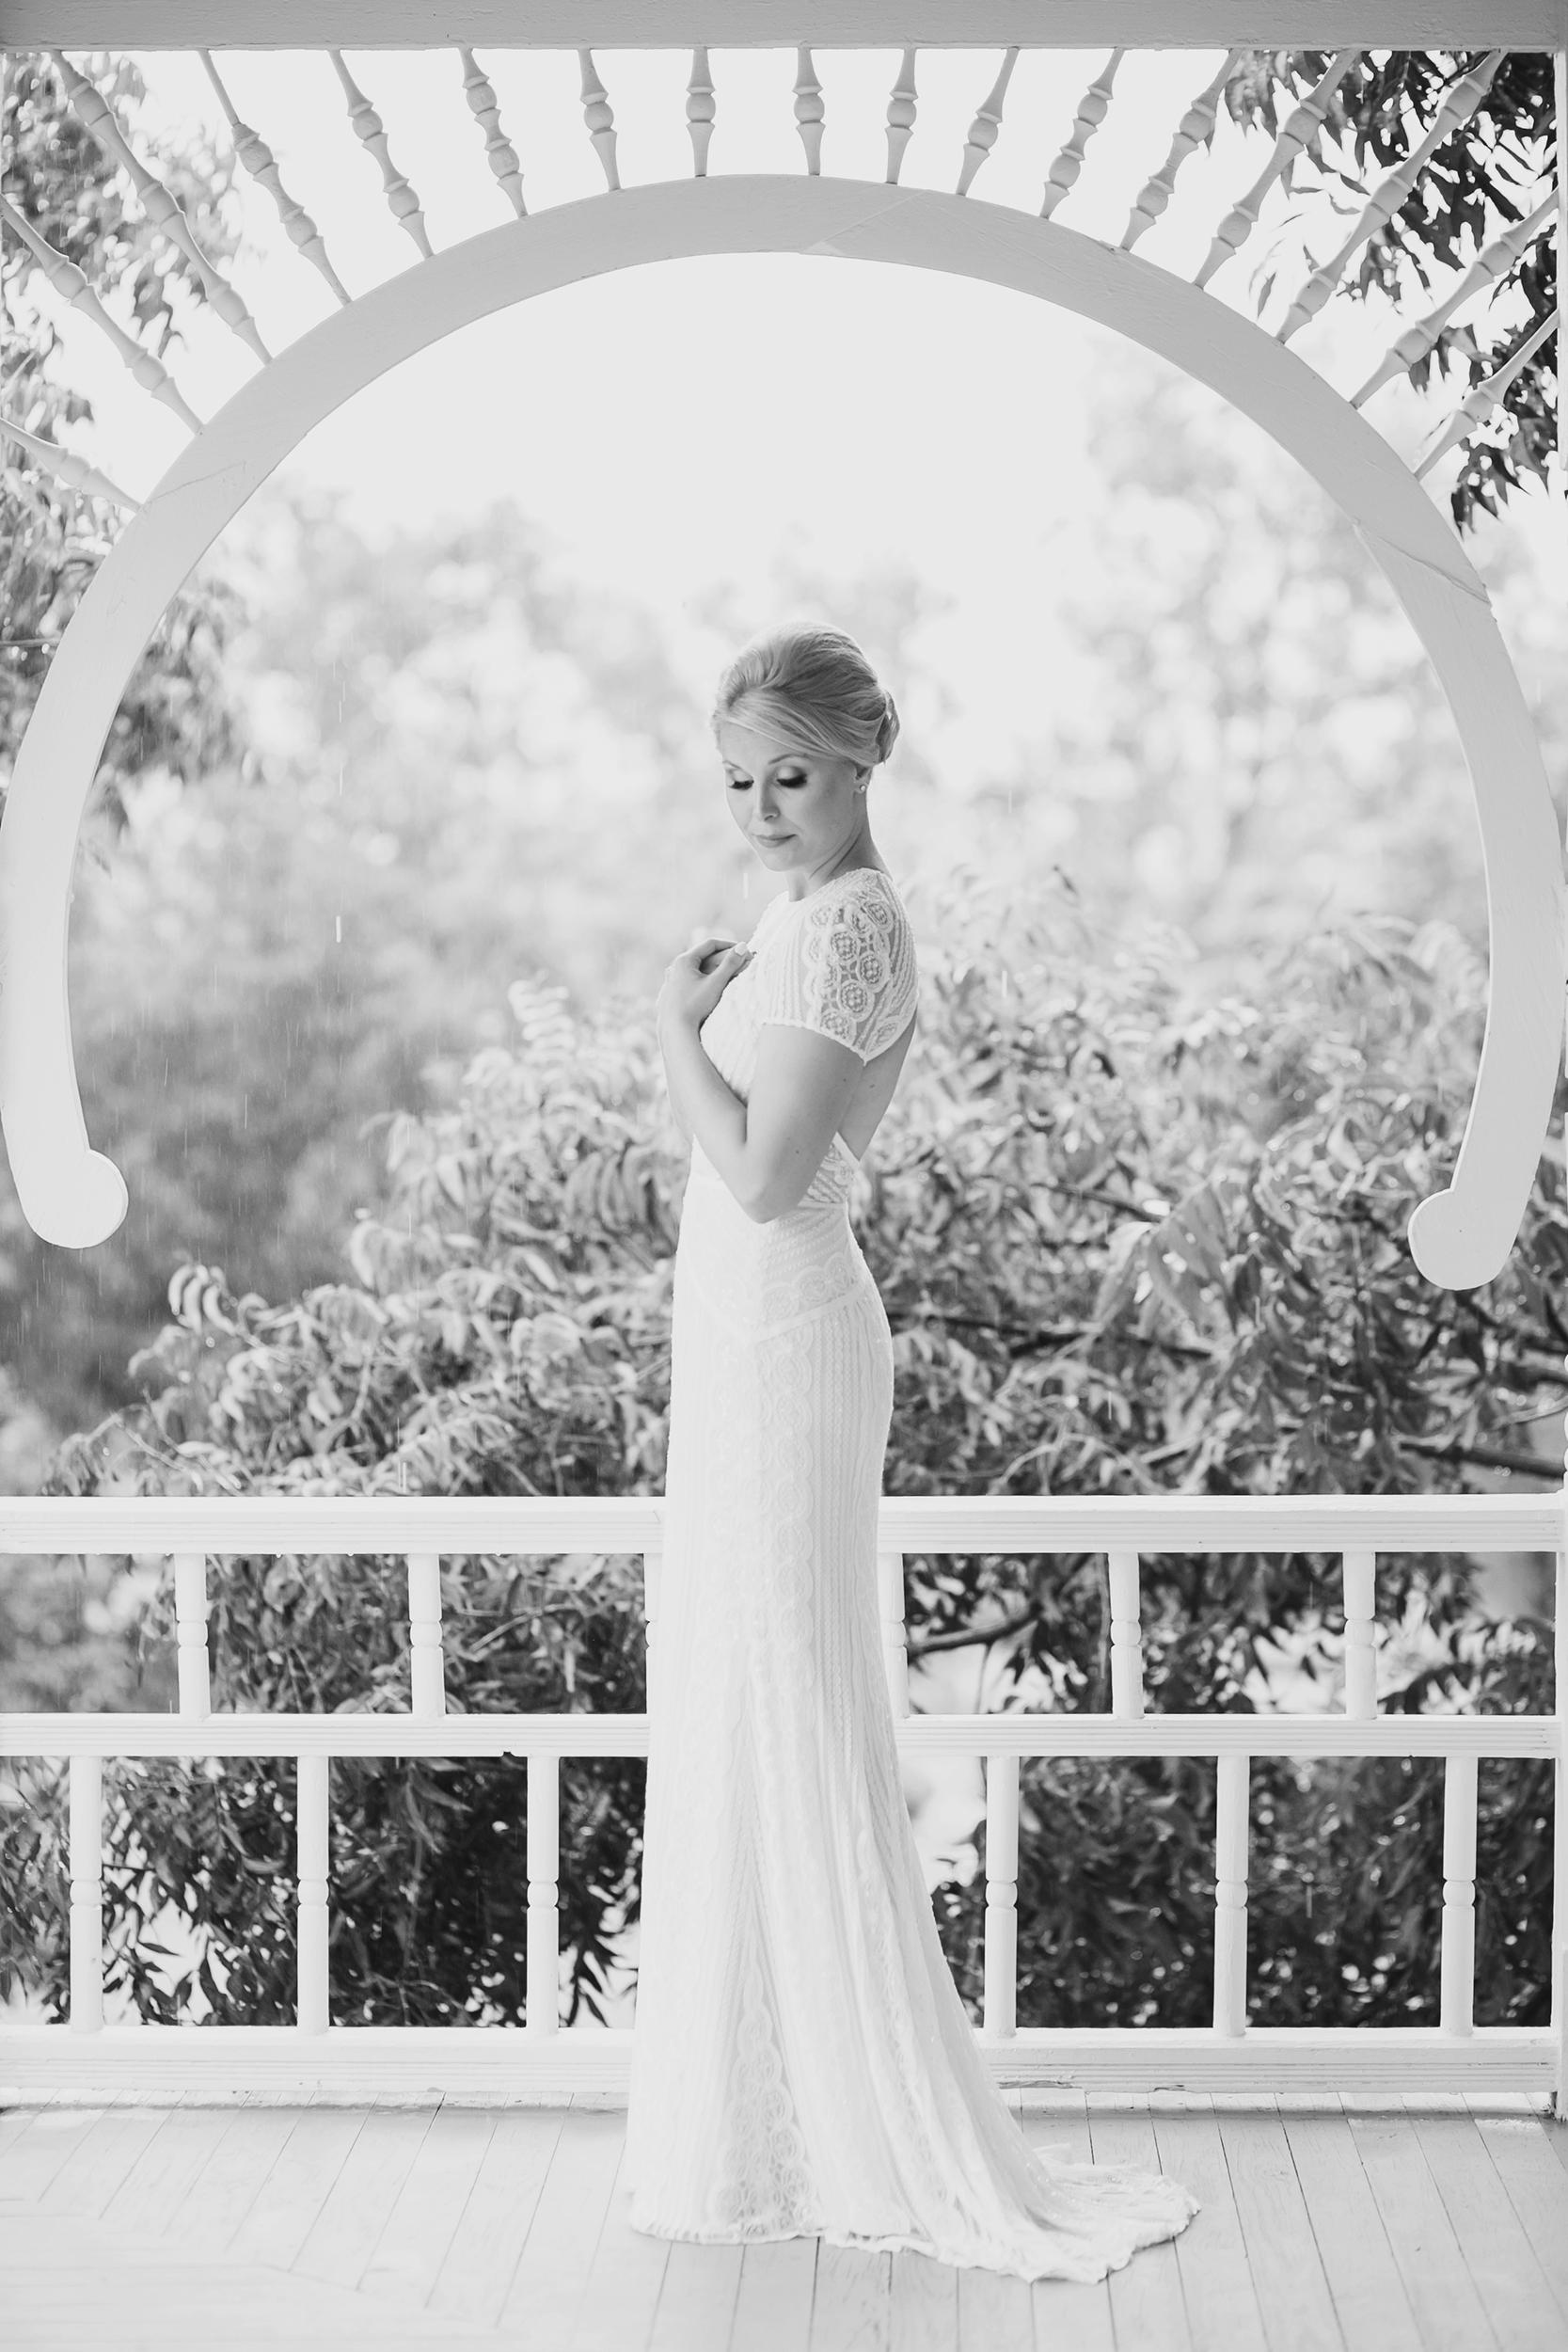 Austin_Wedding_Photographer_Kimberly_Brooke_Photographic_179.jpg